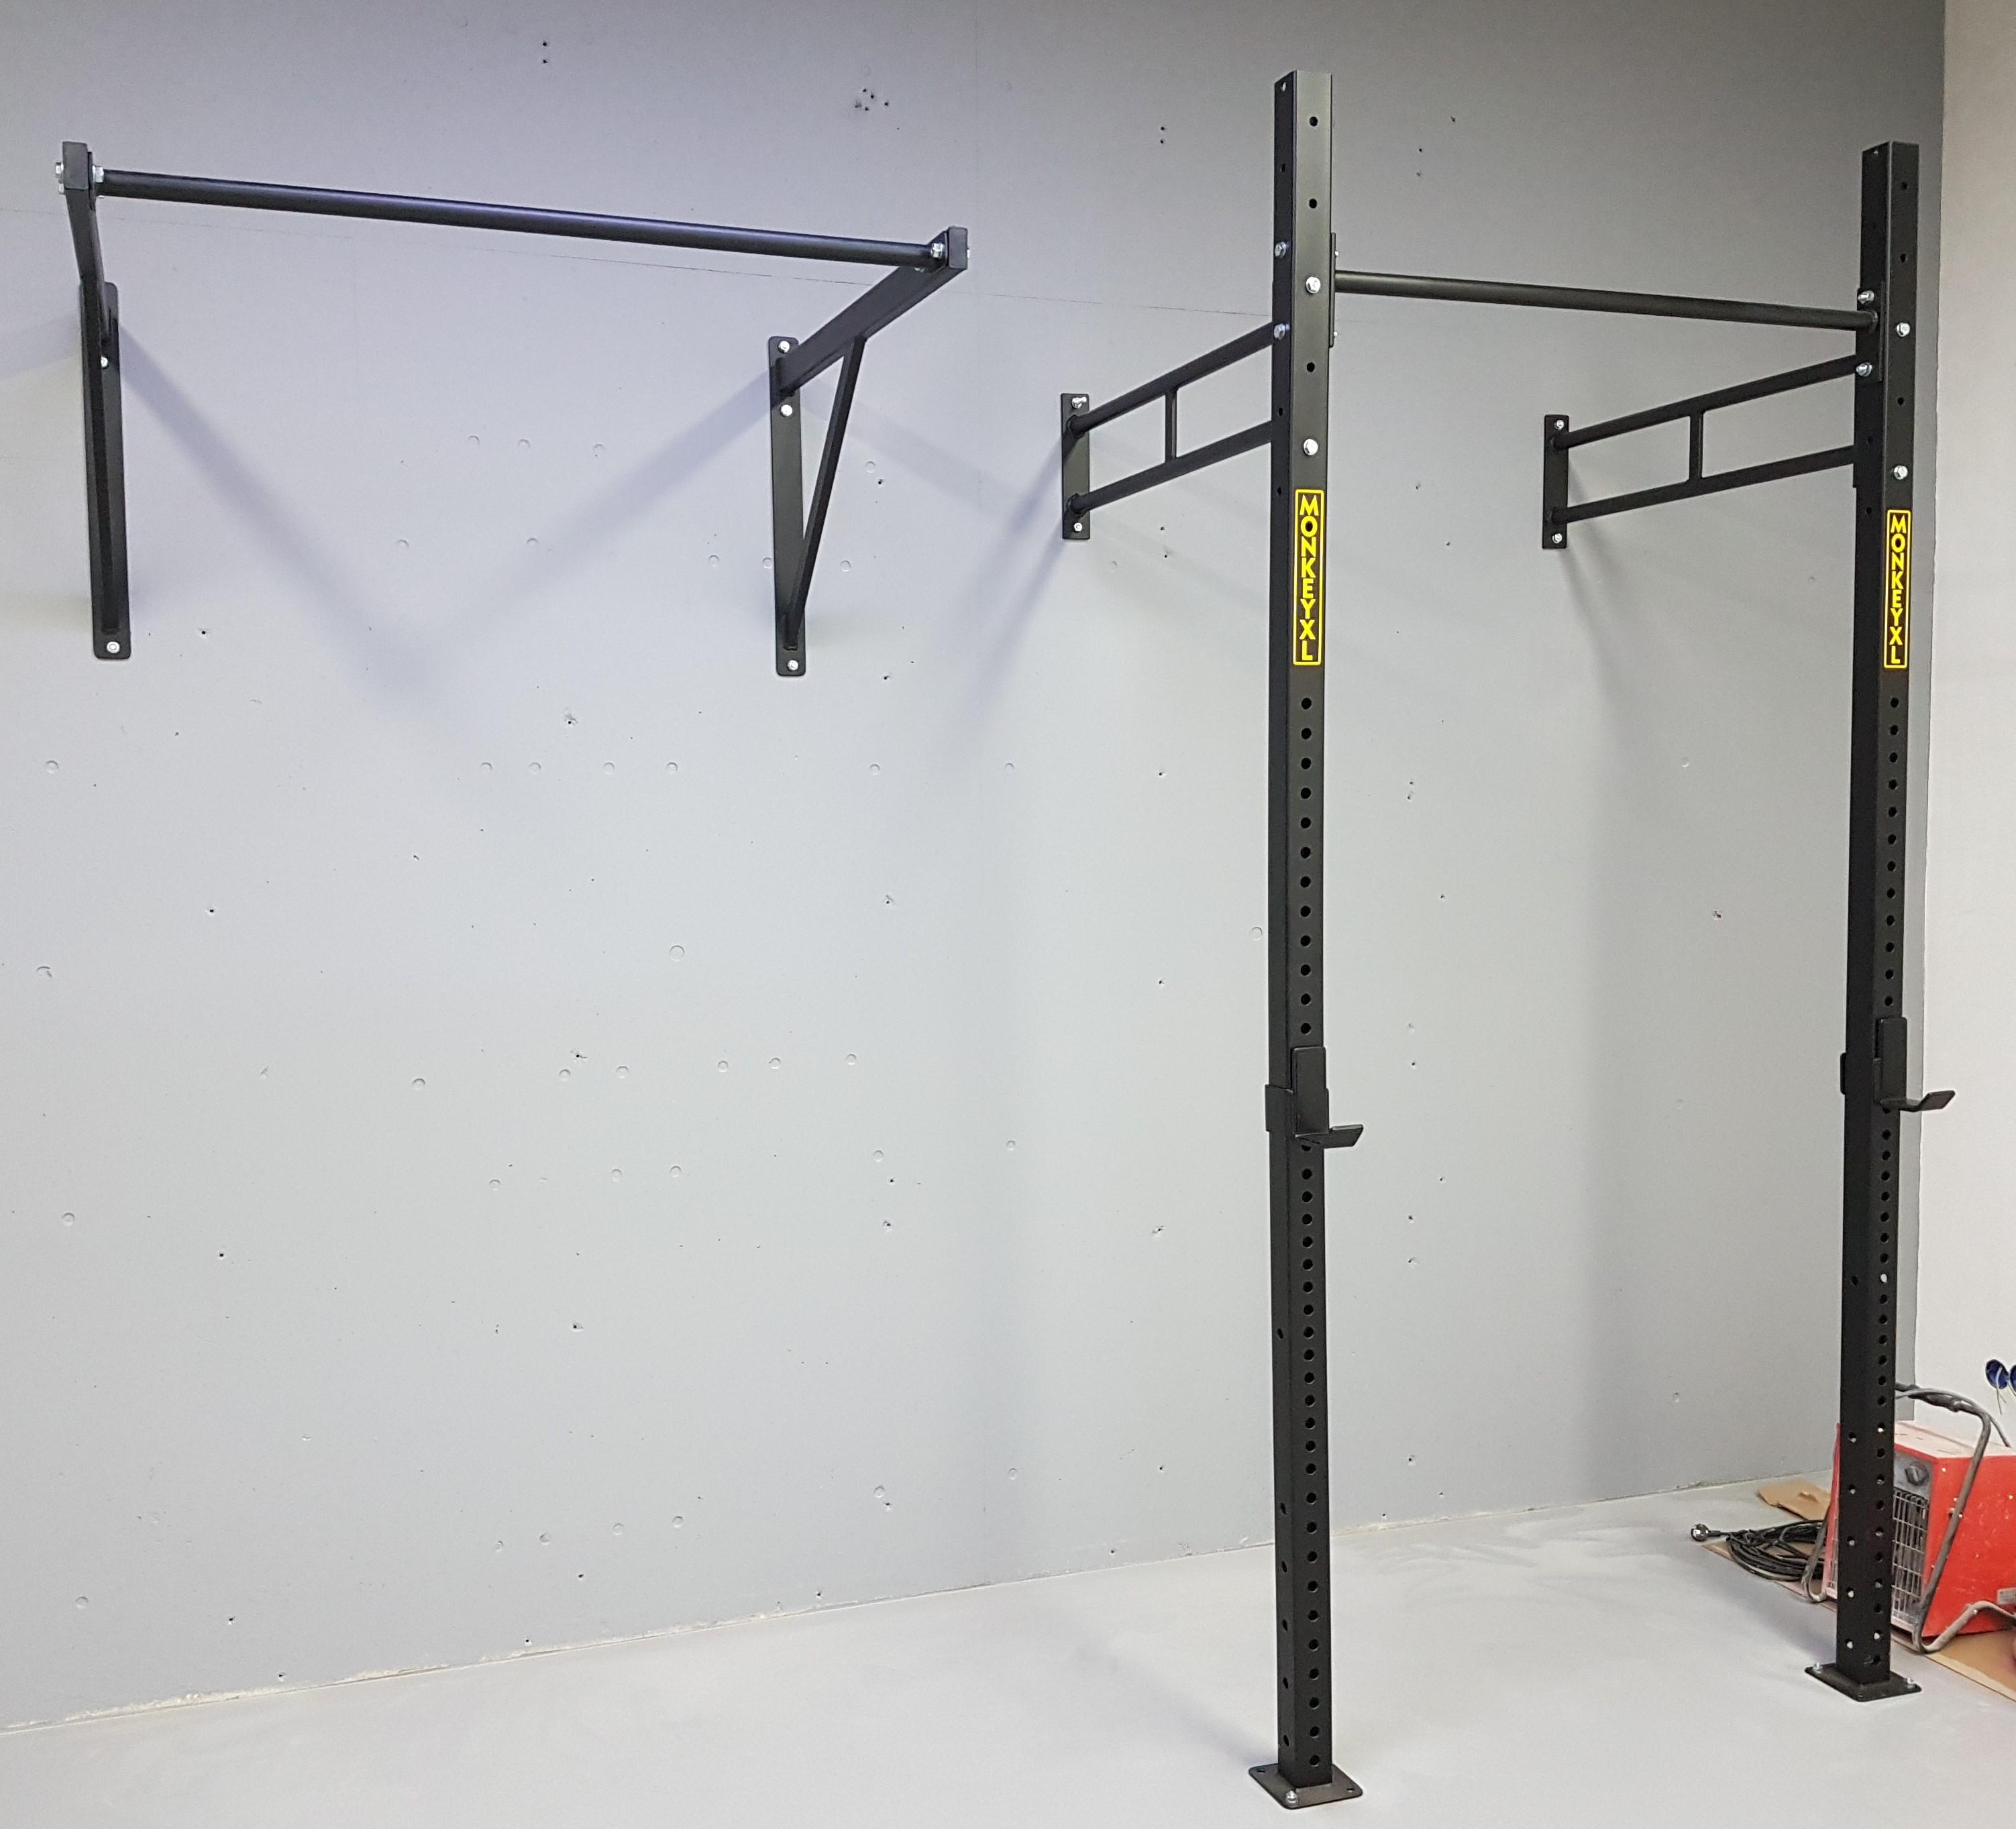 MXL-010 pull up squat rig